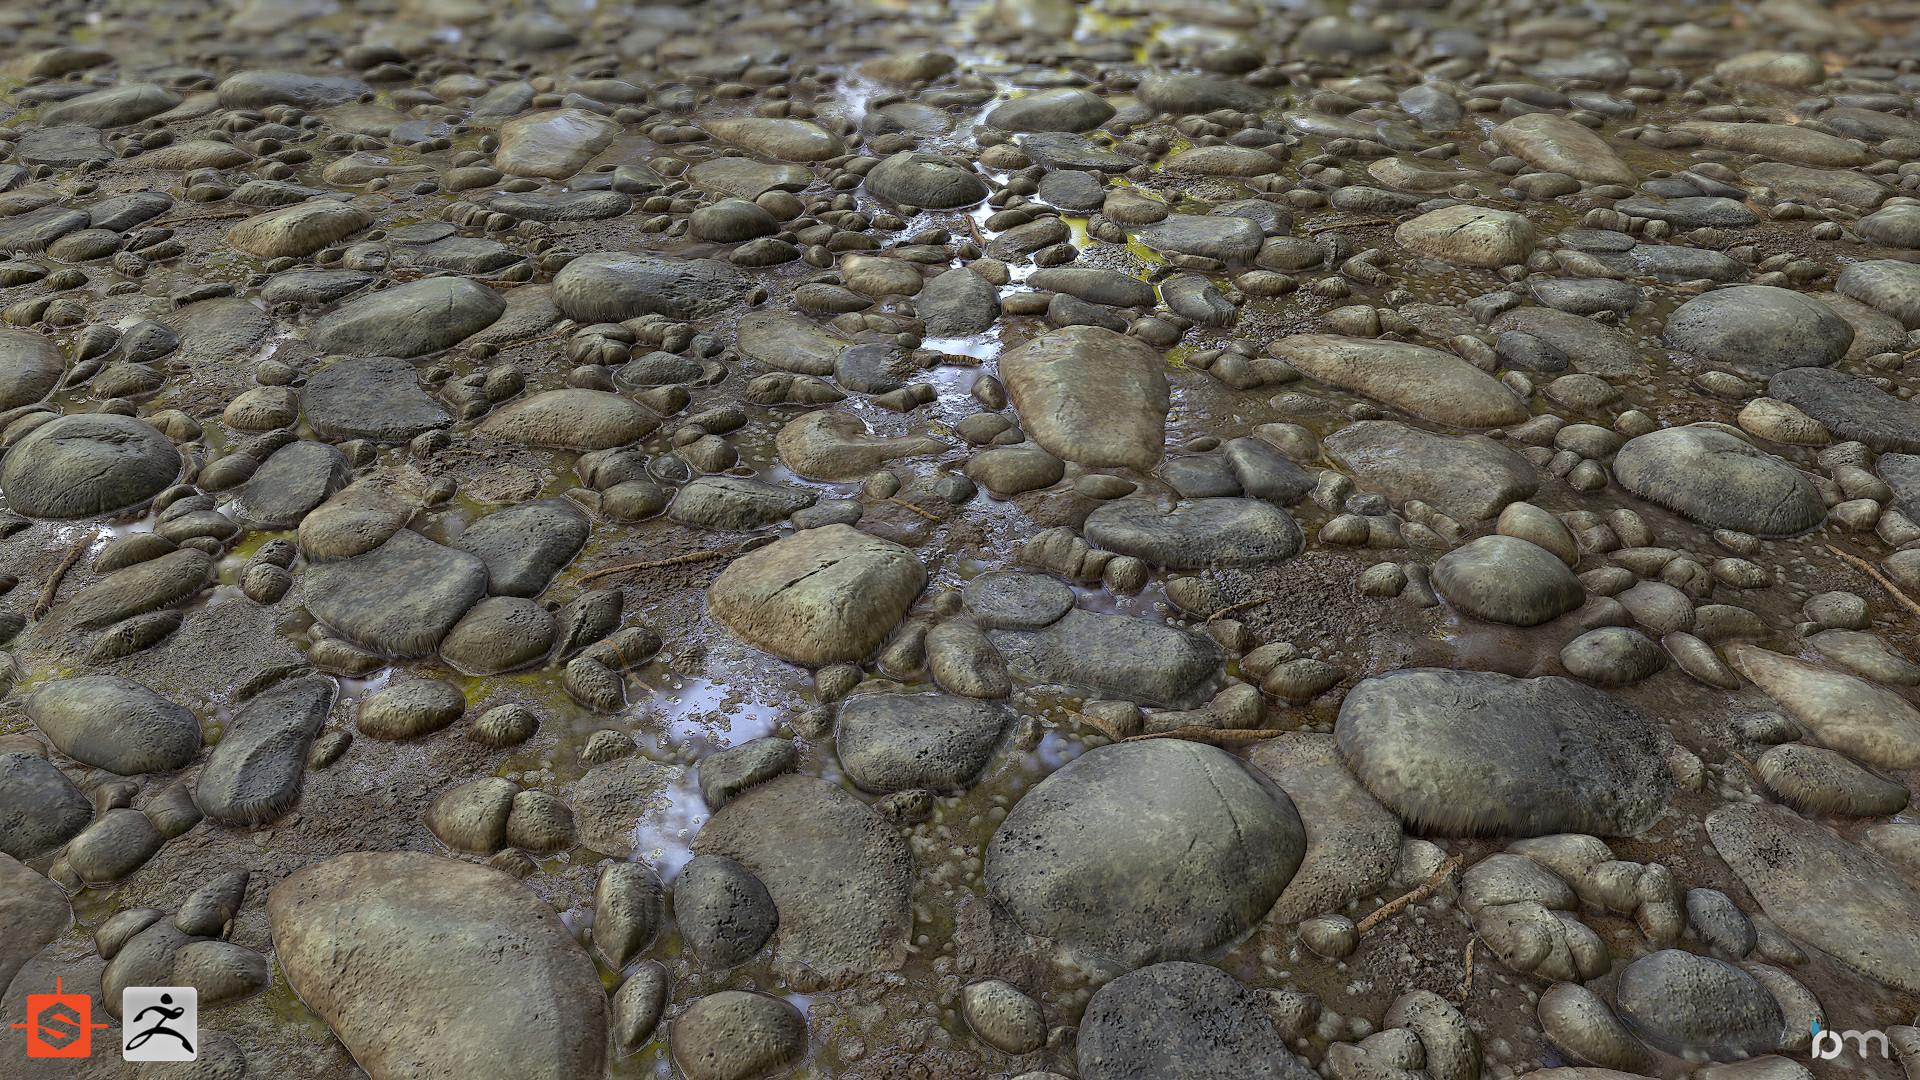 ArtStation - Cobble River Bed, Ben Moseley